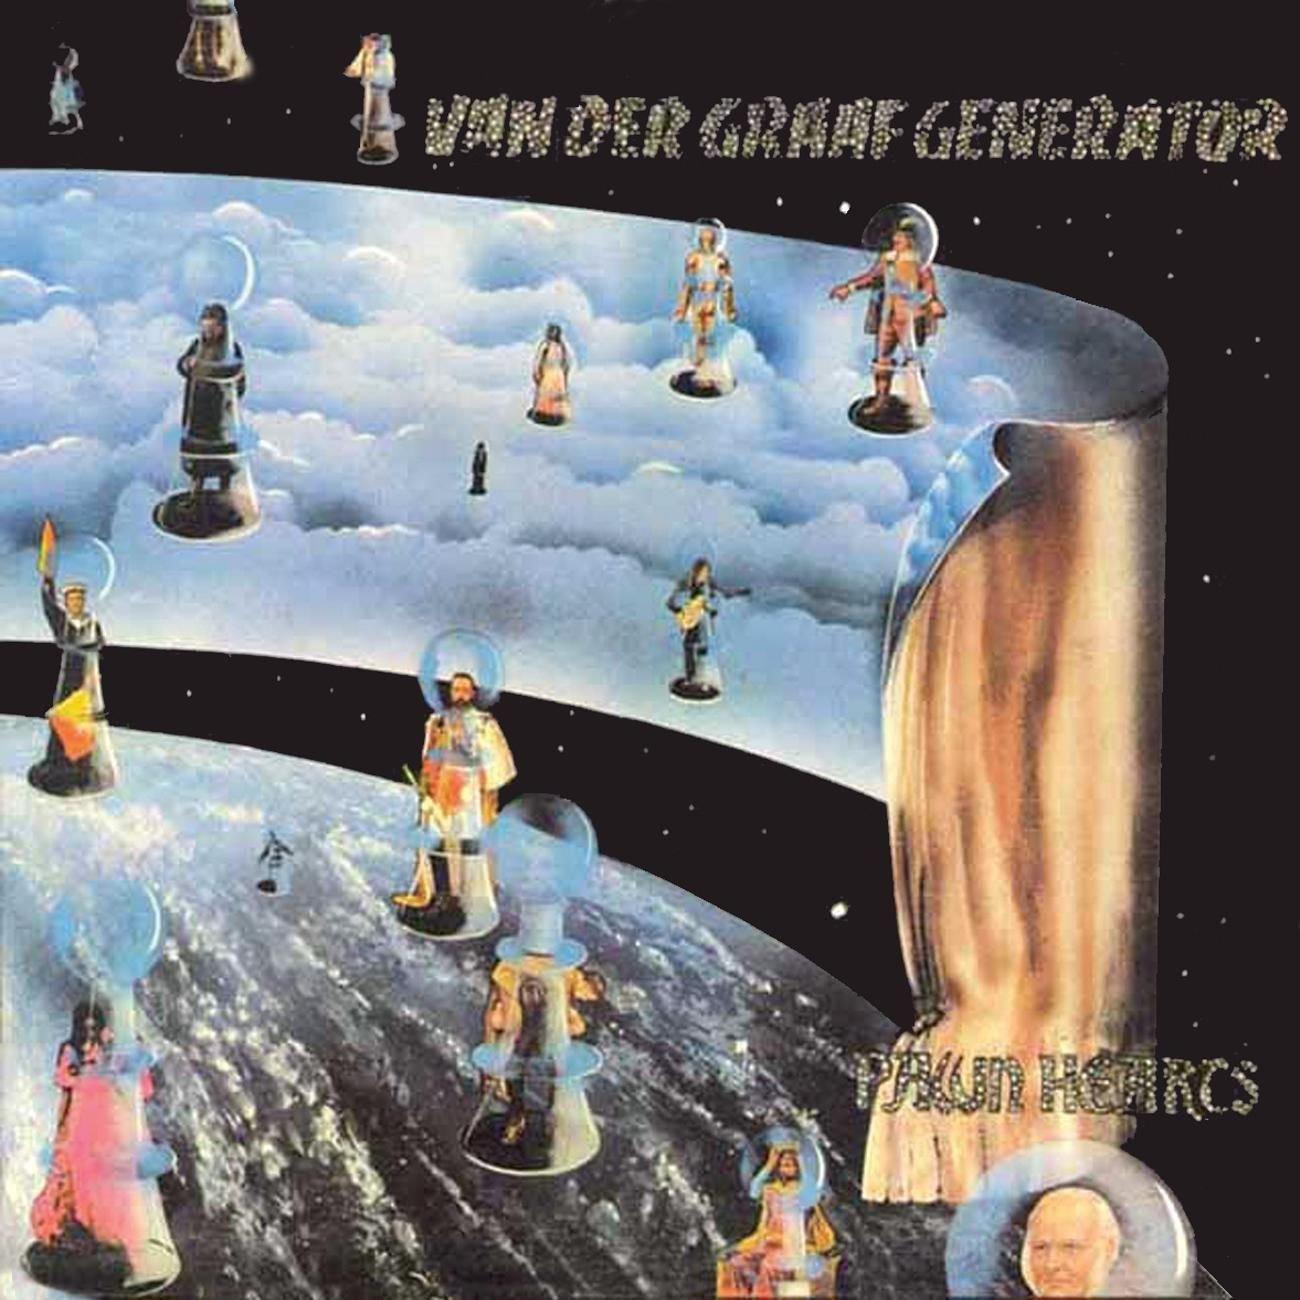 Van Der Graaf Generator Pawn Hearts